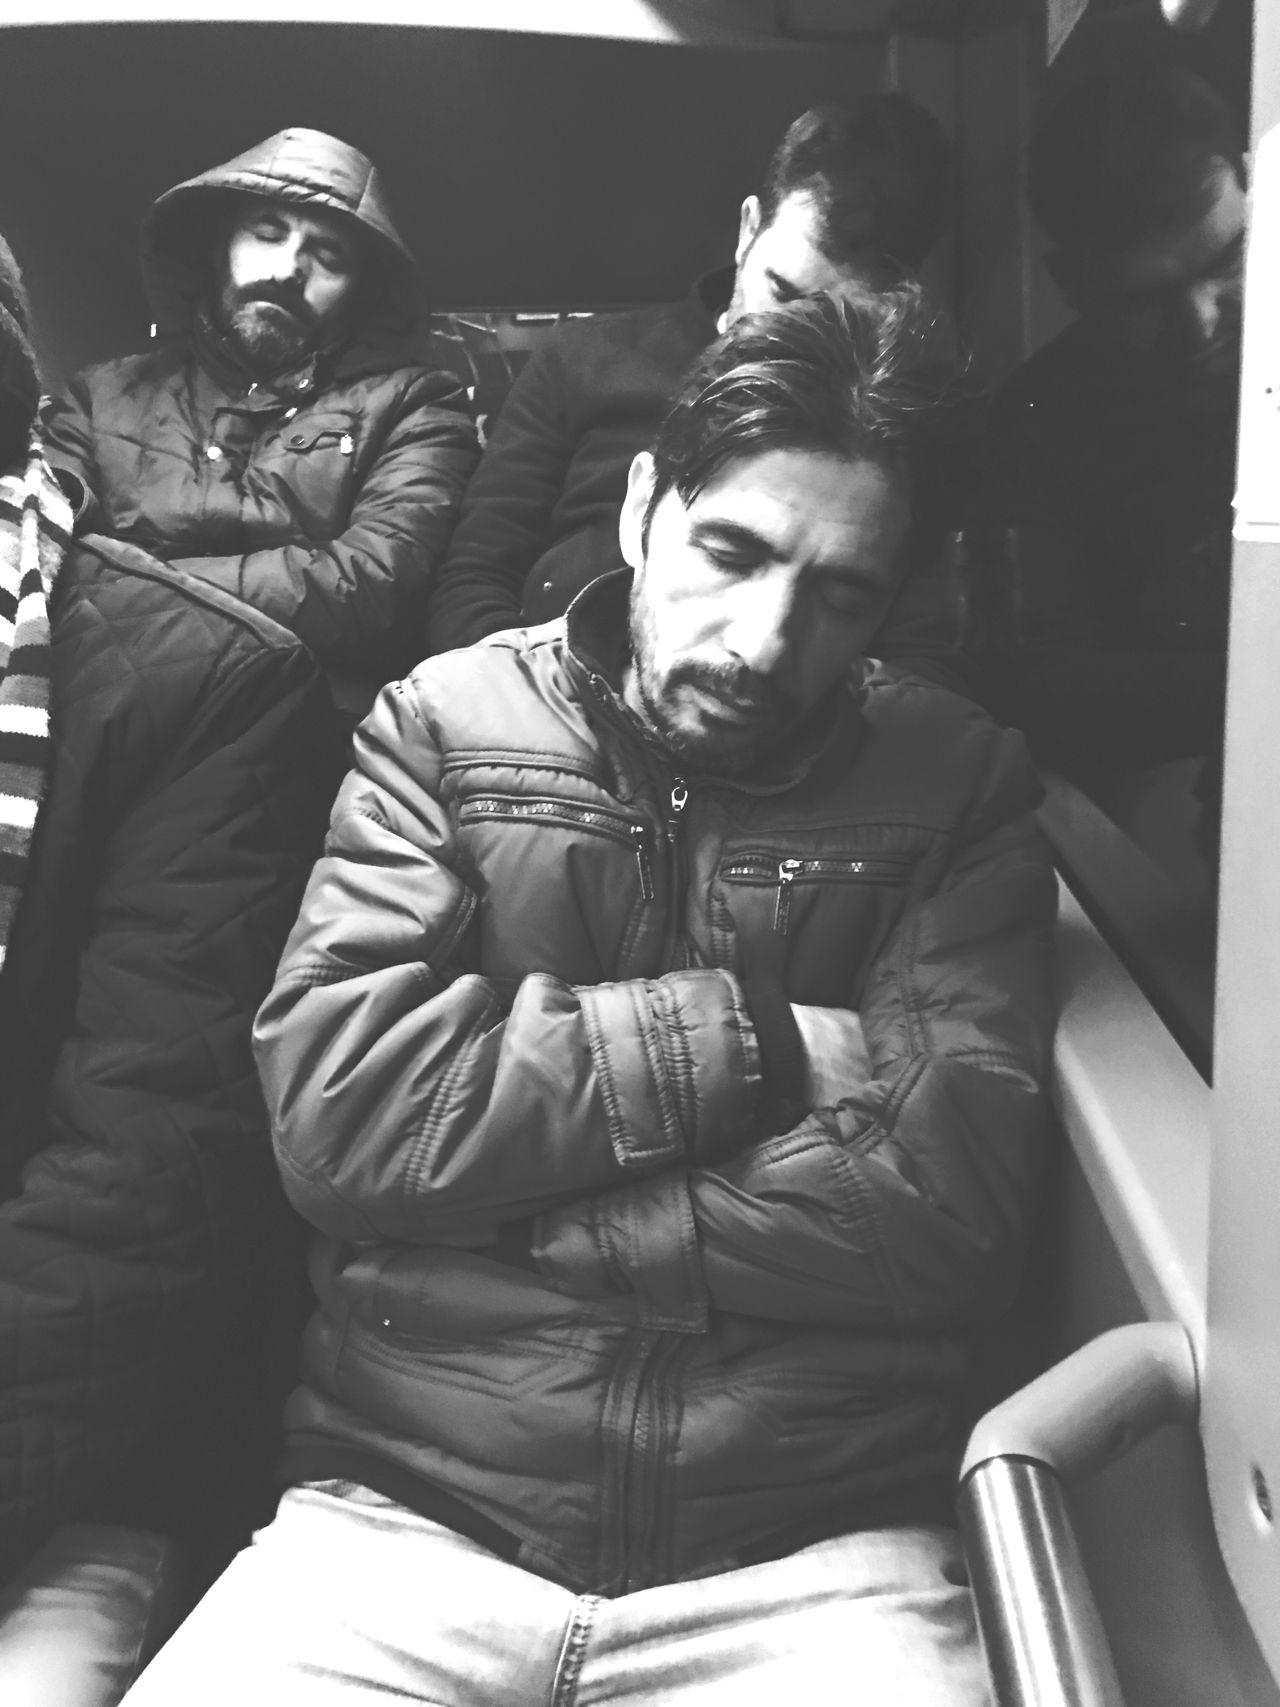 Sleepin in the bus Sleeping Sleep Bus Busstop Bus Ride Bus Stop Otobus Metrobus Dogal Natural Istanbul Istanbul Turkey Istanbuldayasam Istanbul City Istanbullovers Istanbul - Bosphorus Istanbul #turkiye Istanbul Turkiye Turkey Türkiye Passenger Art Art, Drawing, Creativity Creativity Creative